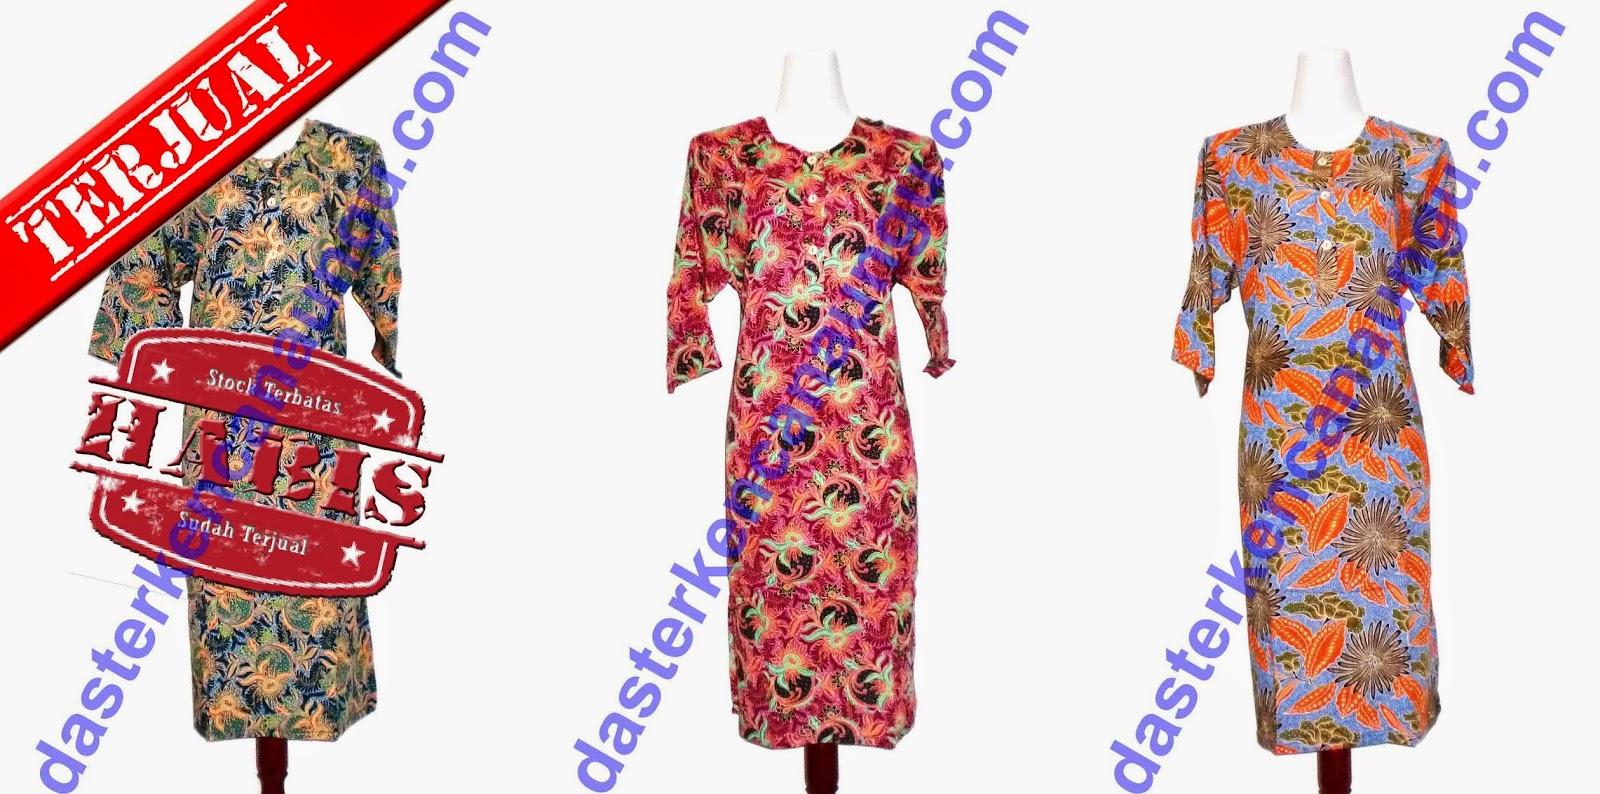 Harga Jual Baju Tidur Batik Kencana Ungu Setelan Babydoll Daster Jumbo Label Biru Online 19